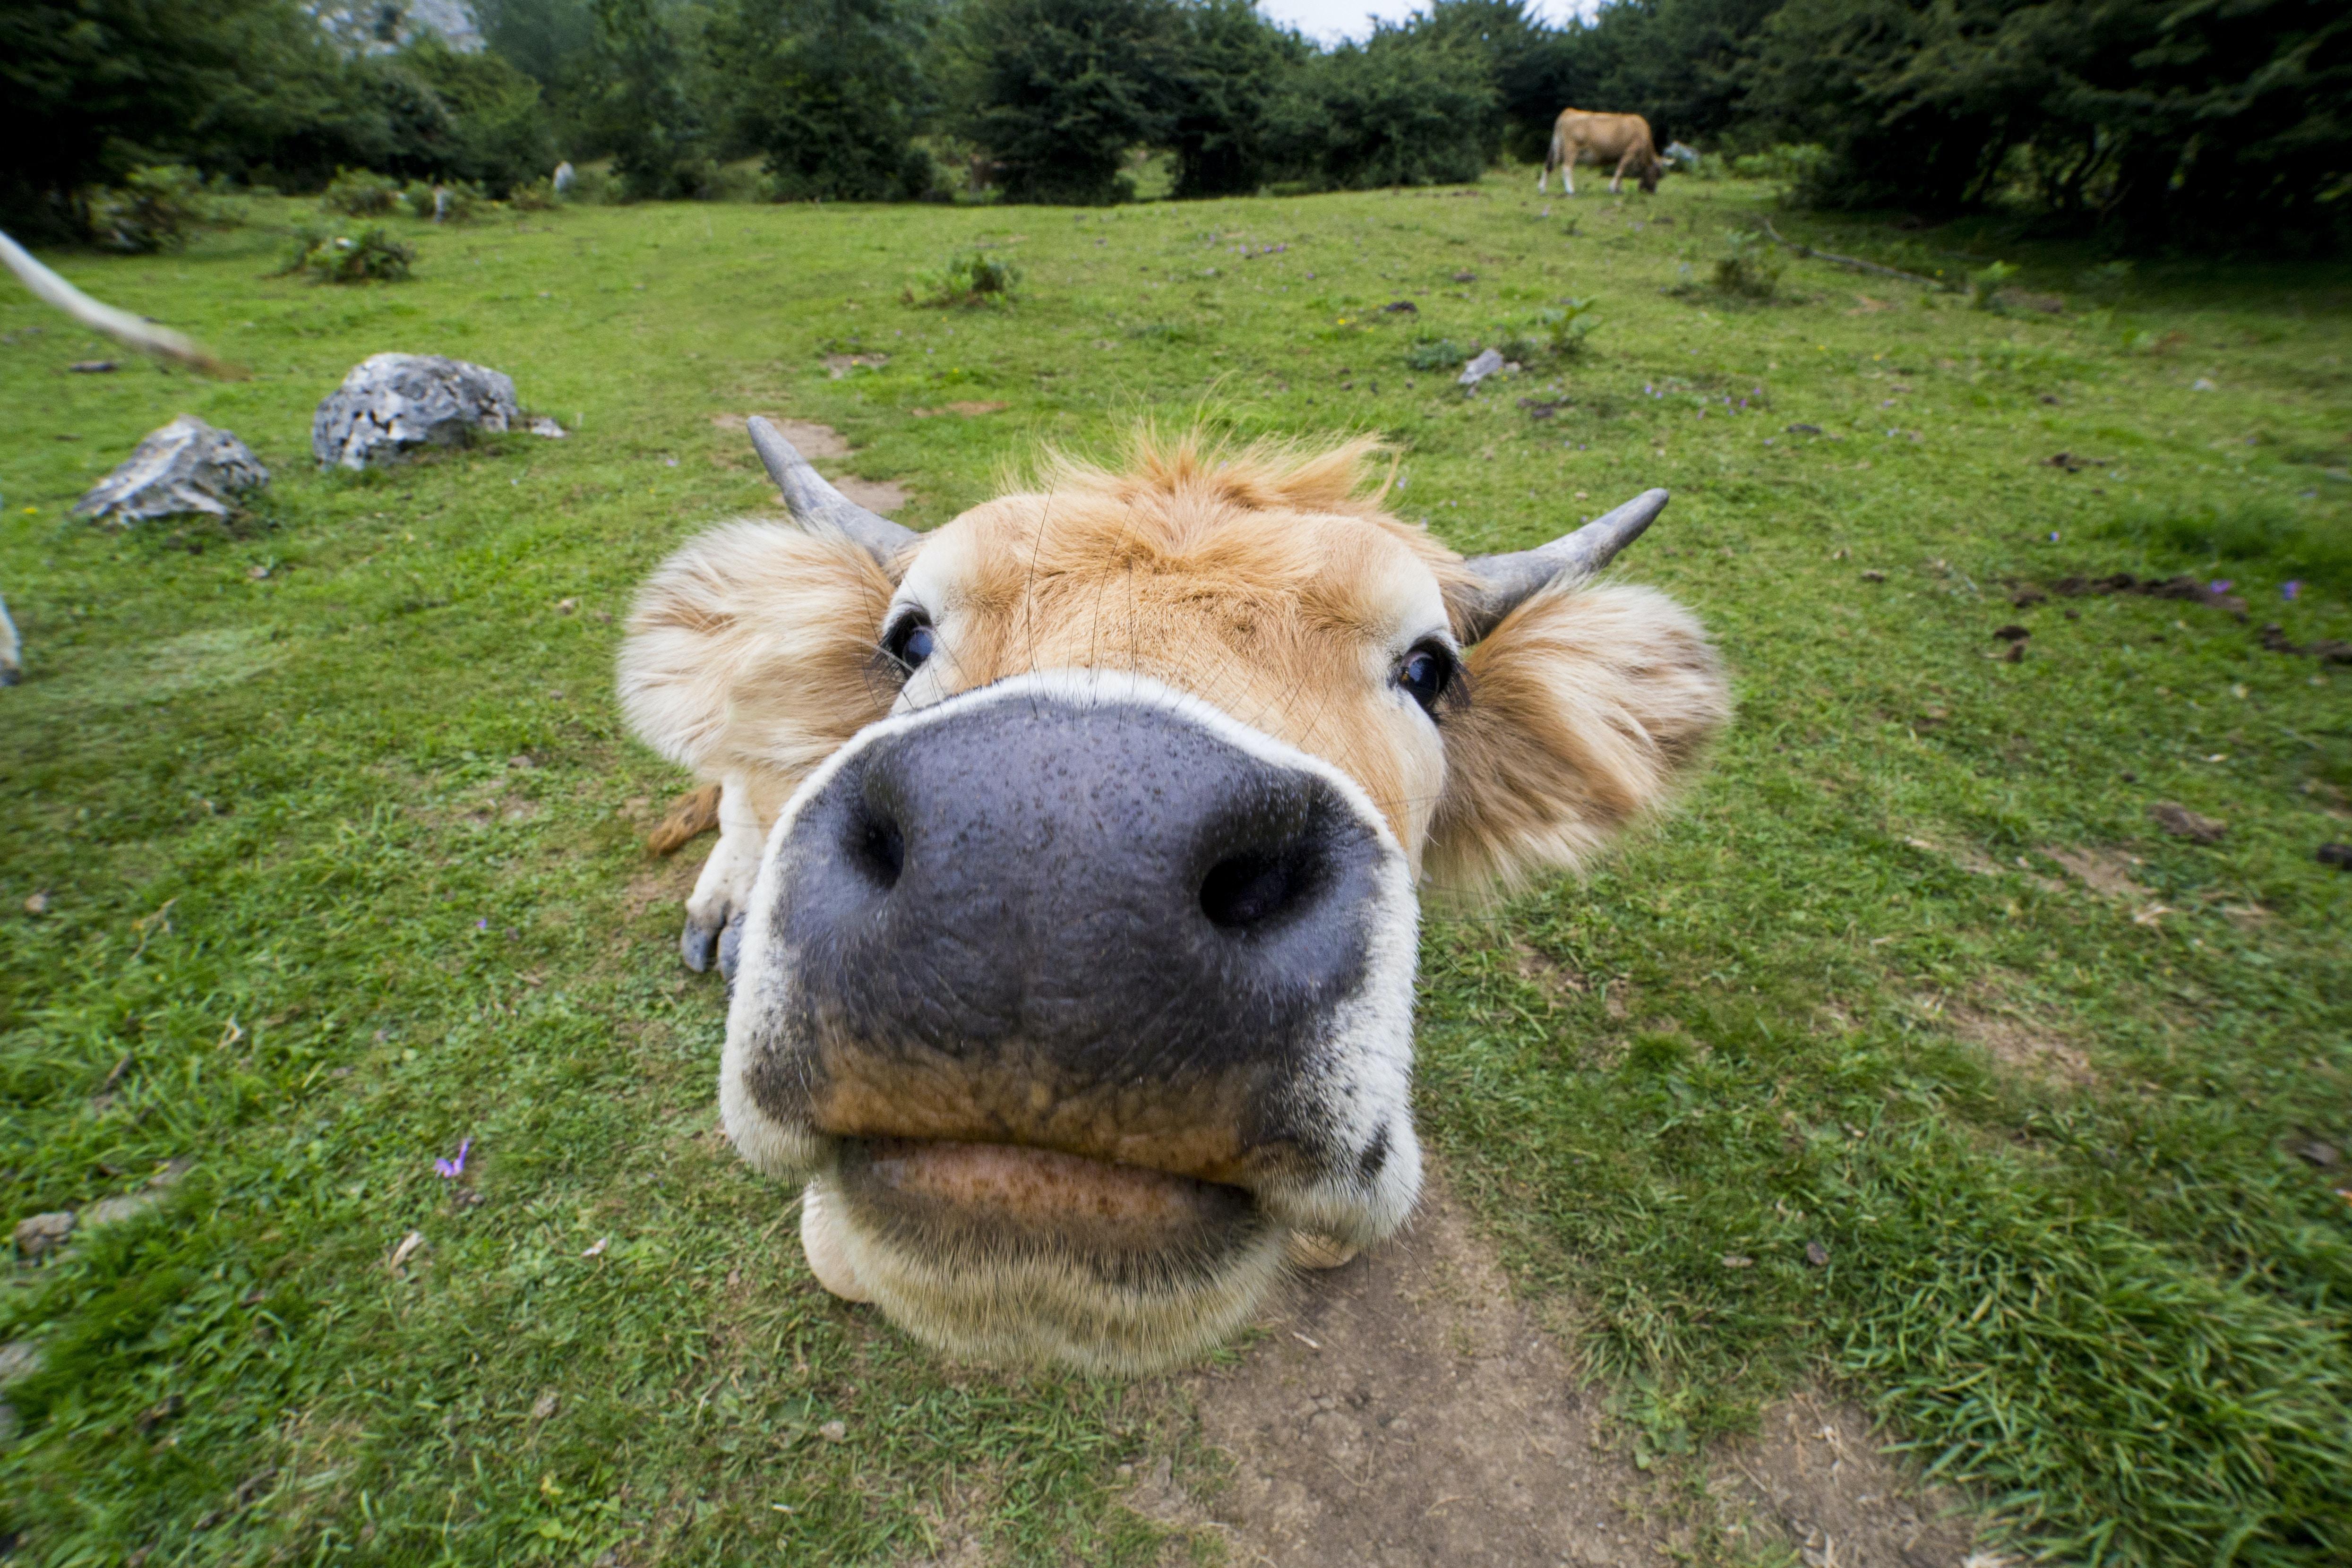 close-up photo of brown animal during daytime